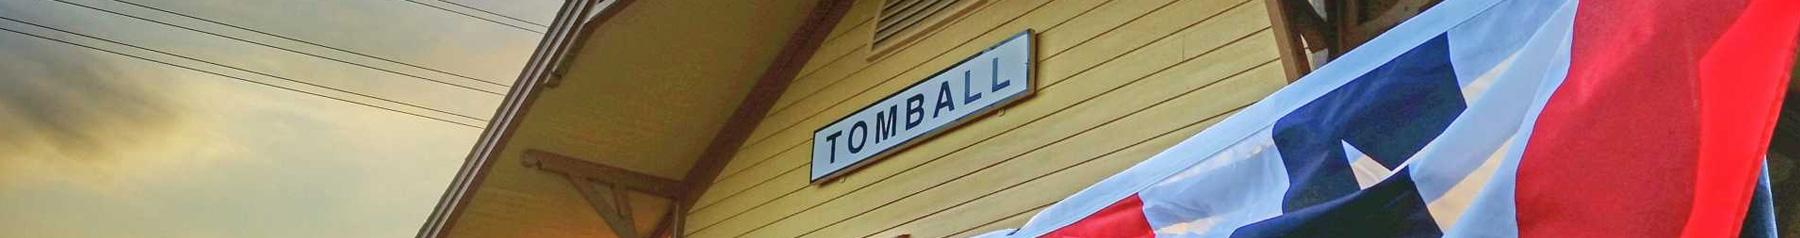 Tomball Railroad Depot